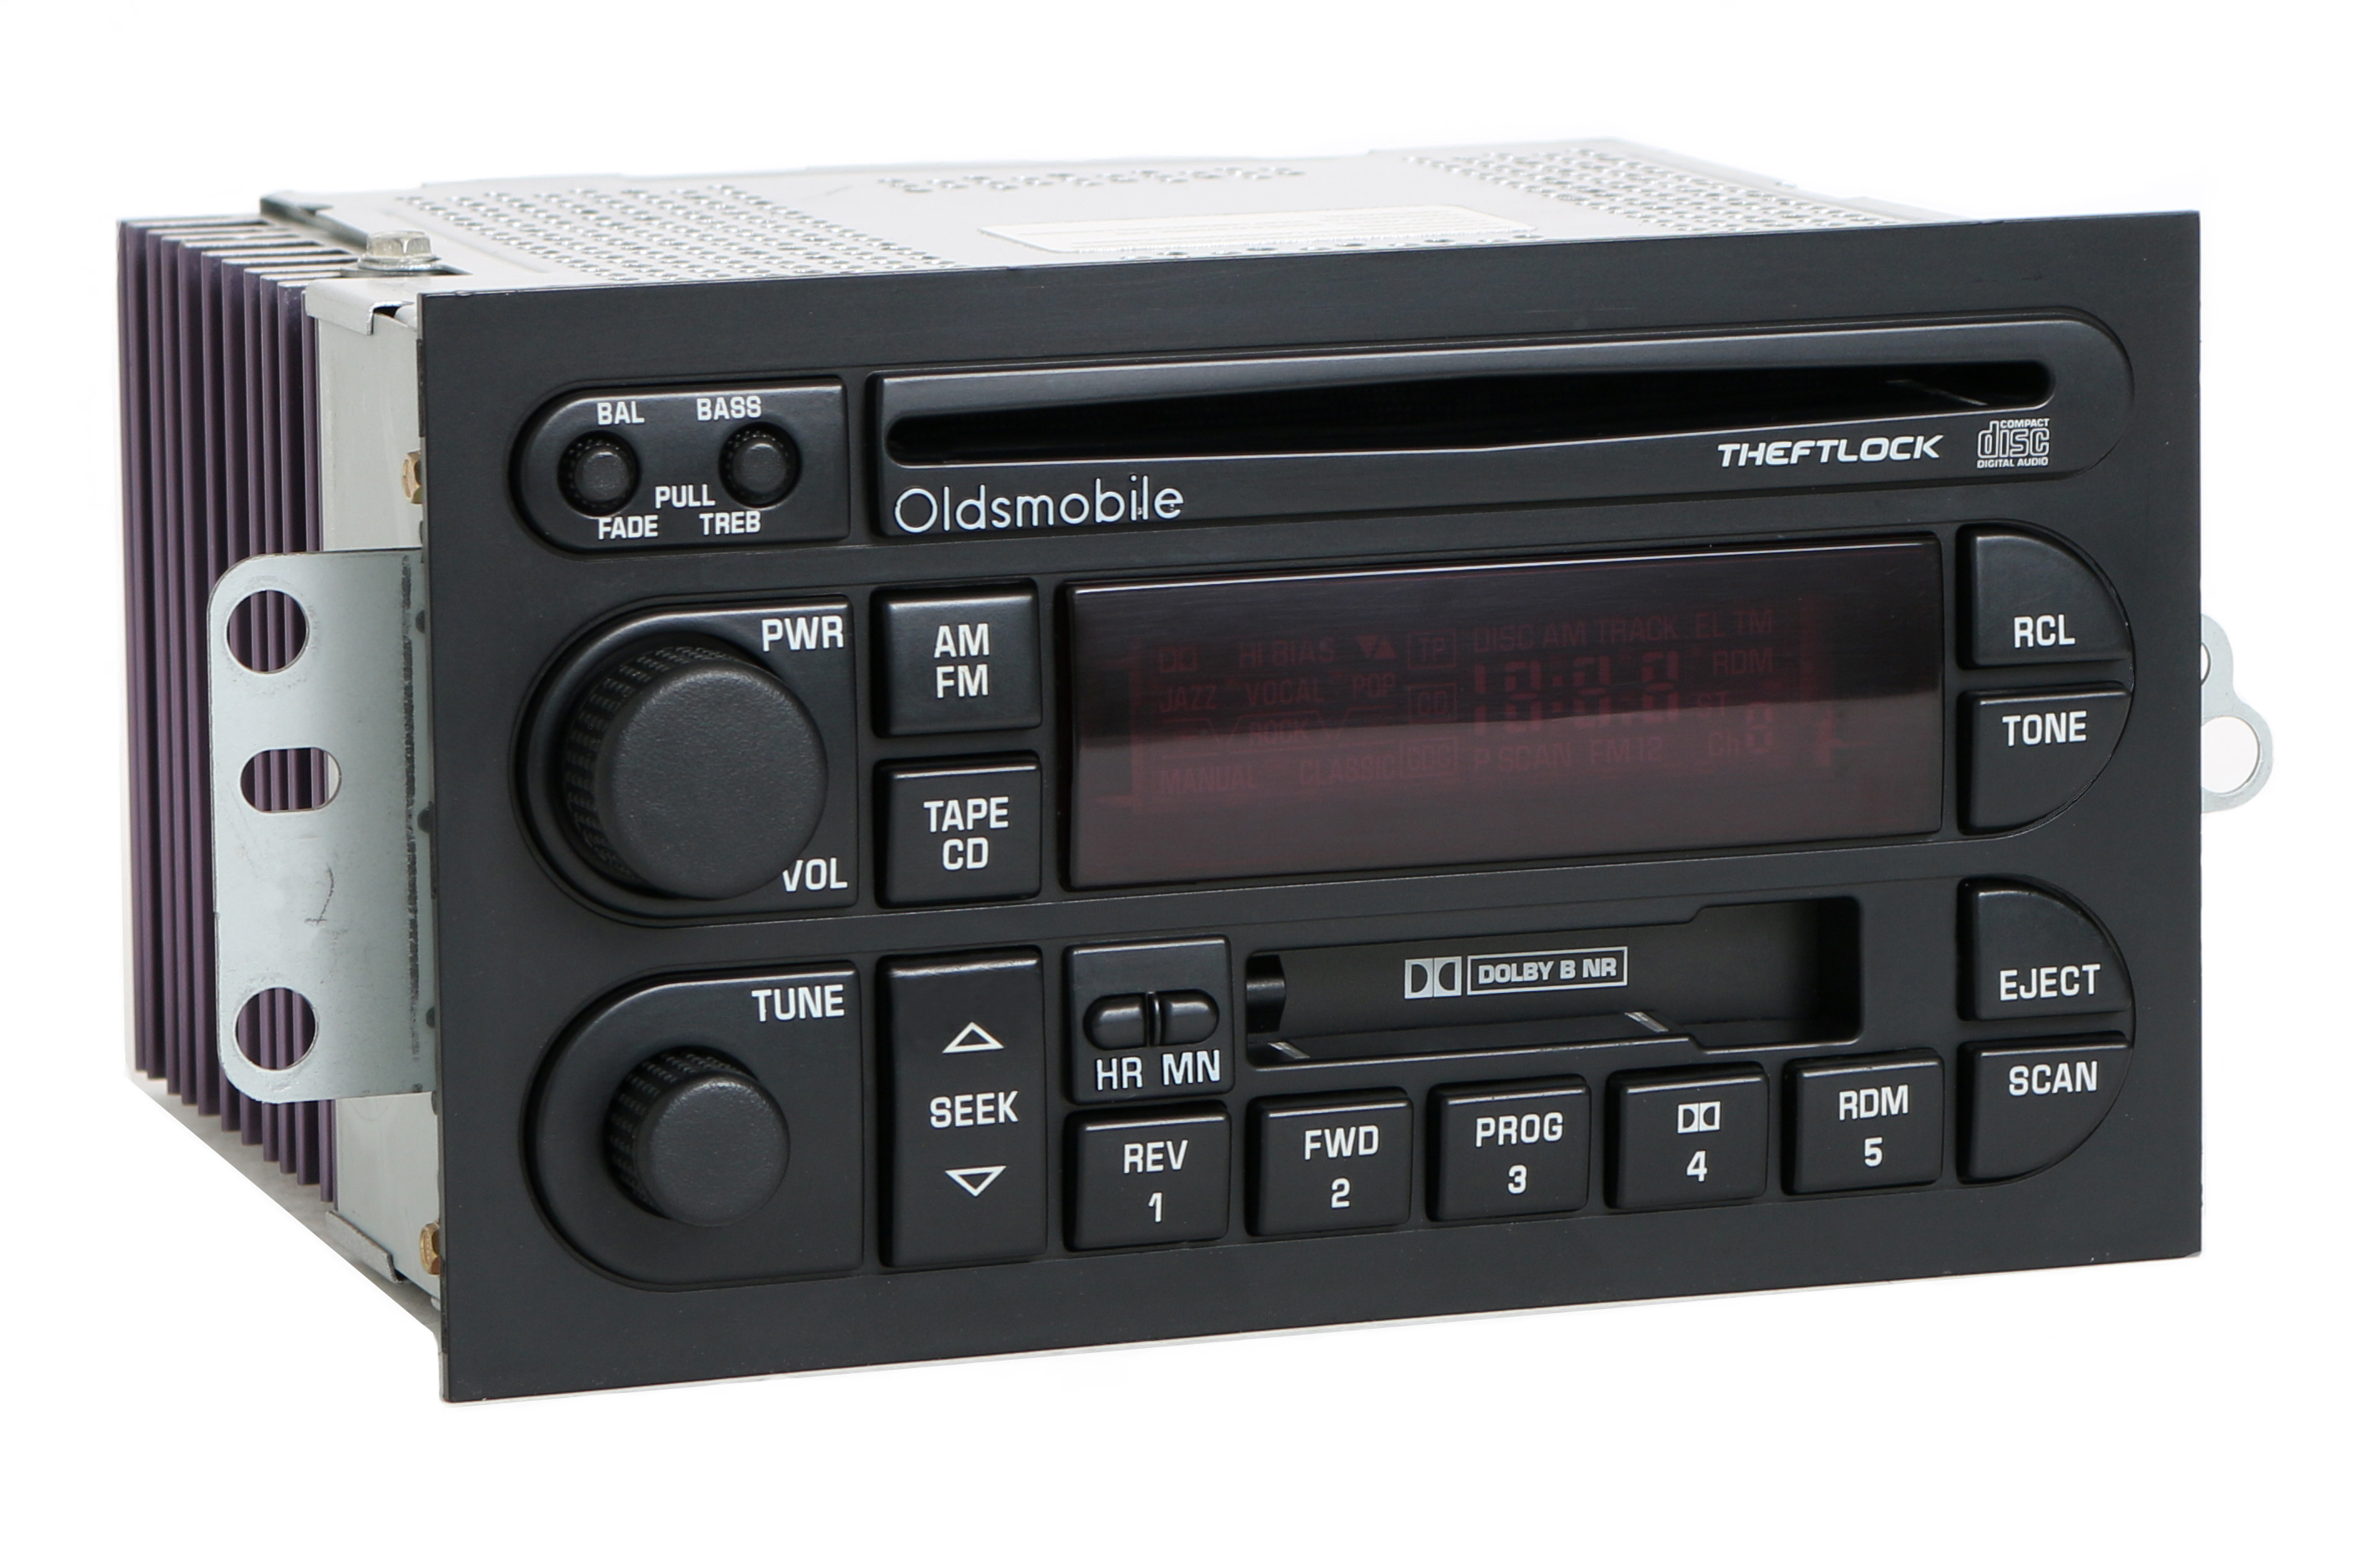 oldsmobile 1996 2000 achieva bravada custlass radio am fm cd cassette 16213343 ebay. Black Bedroom Furniture Sets. Home Design Ideas